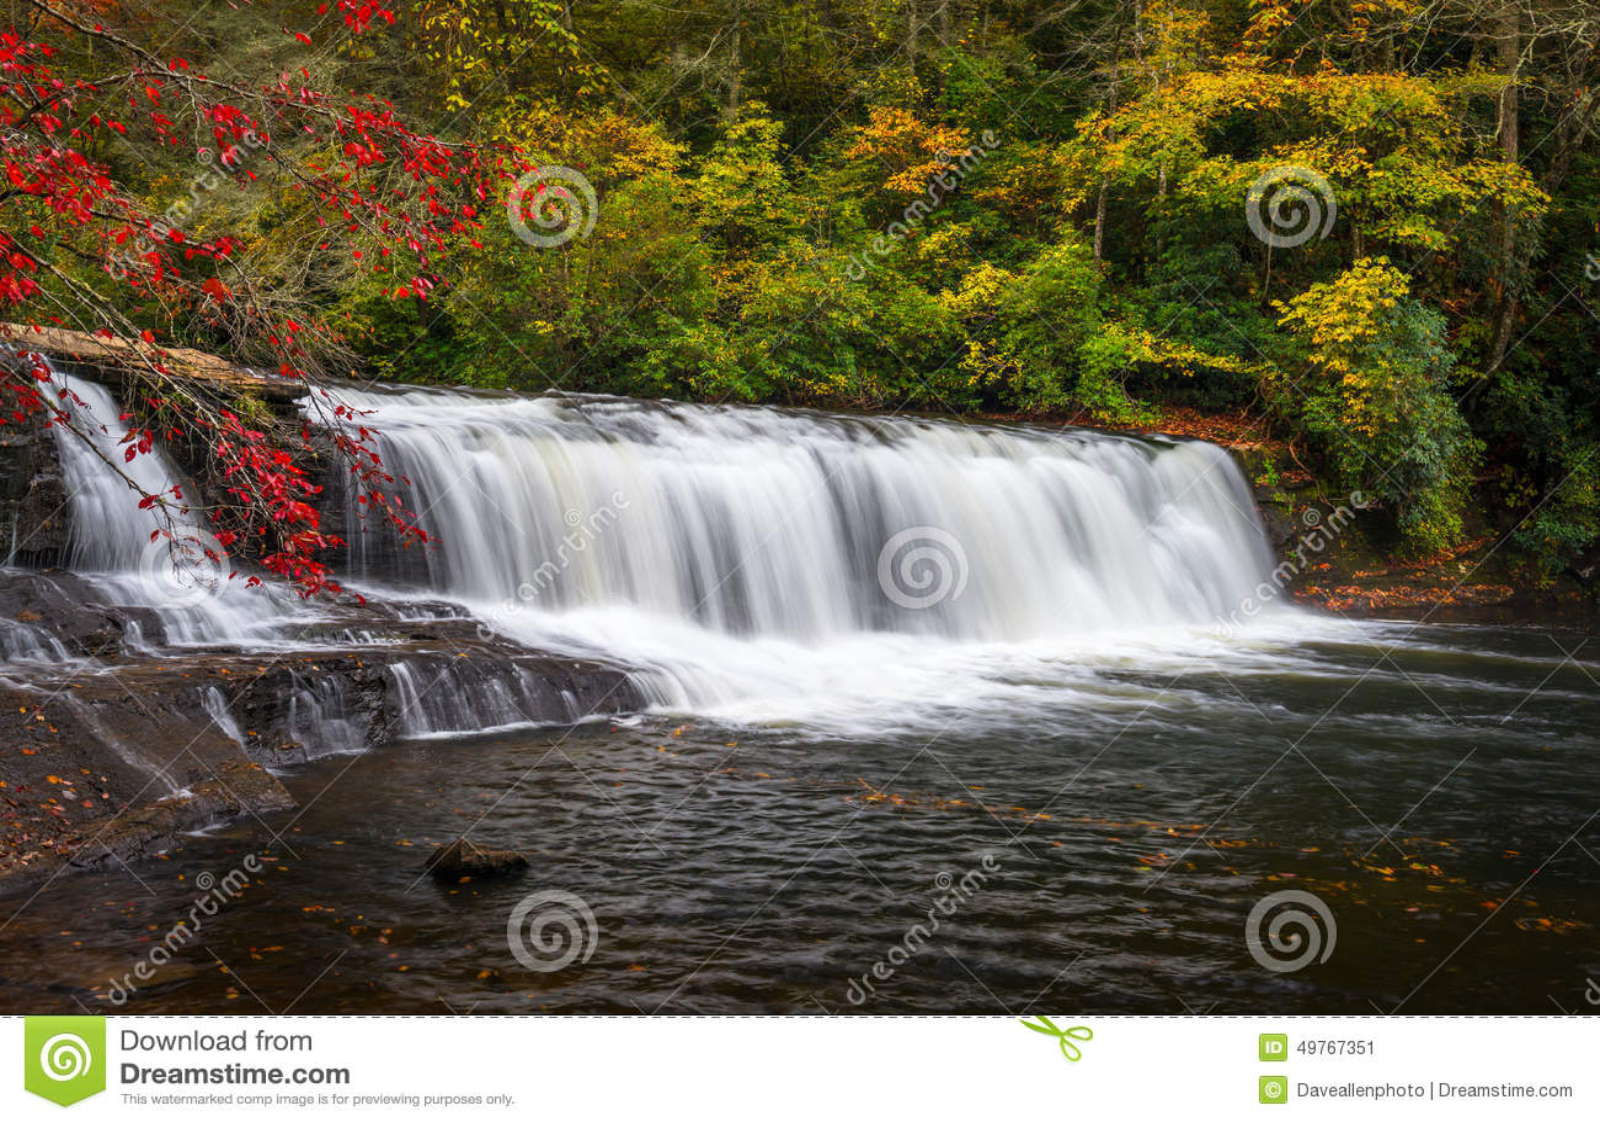 Autumn Waterfall Landscape North Carolina Blue Ridge Mountains